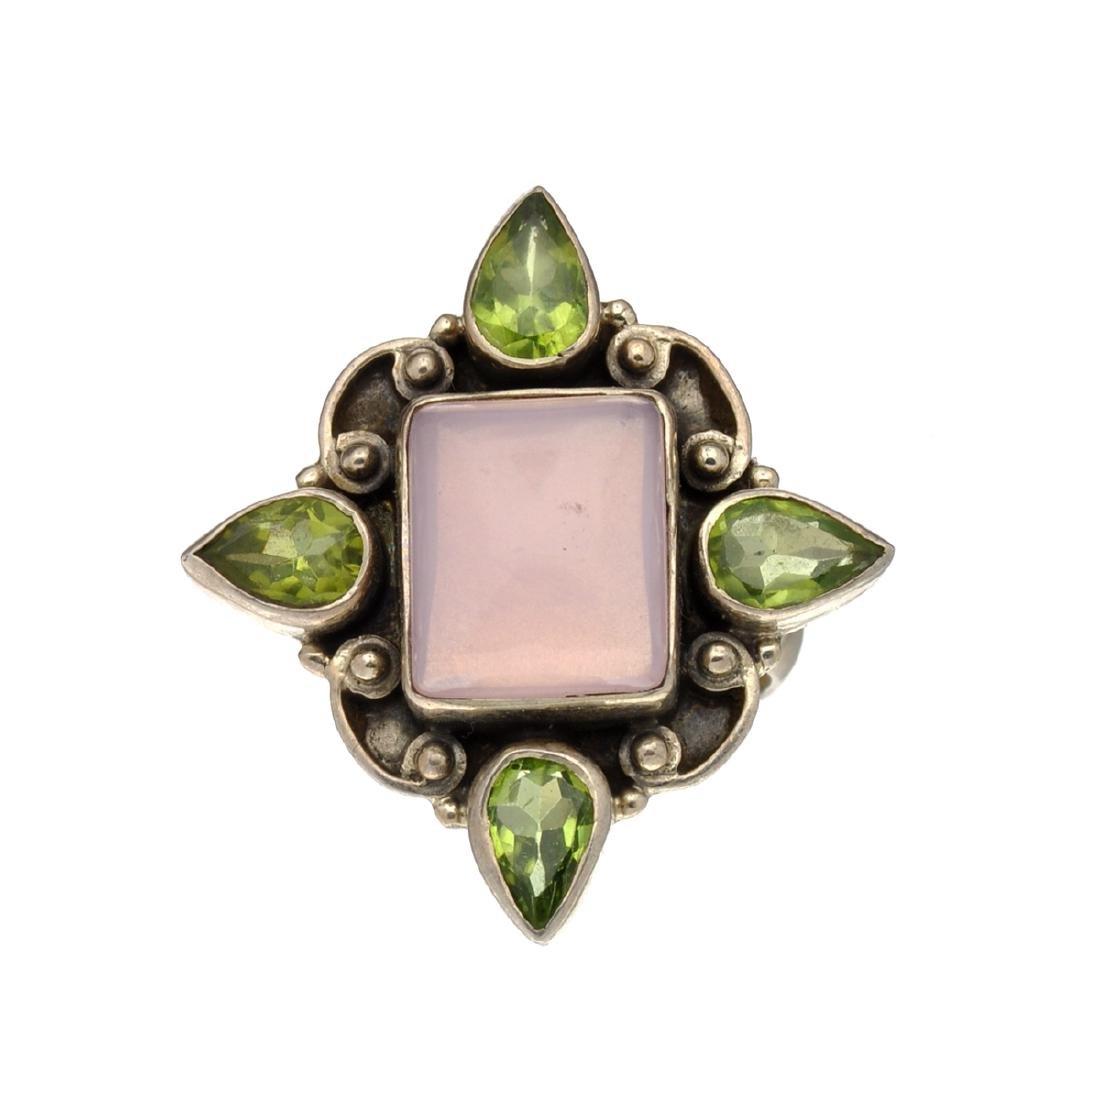 Rare Designer Sebastian Vintage, Peridot And Opal